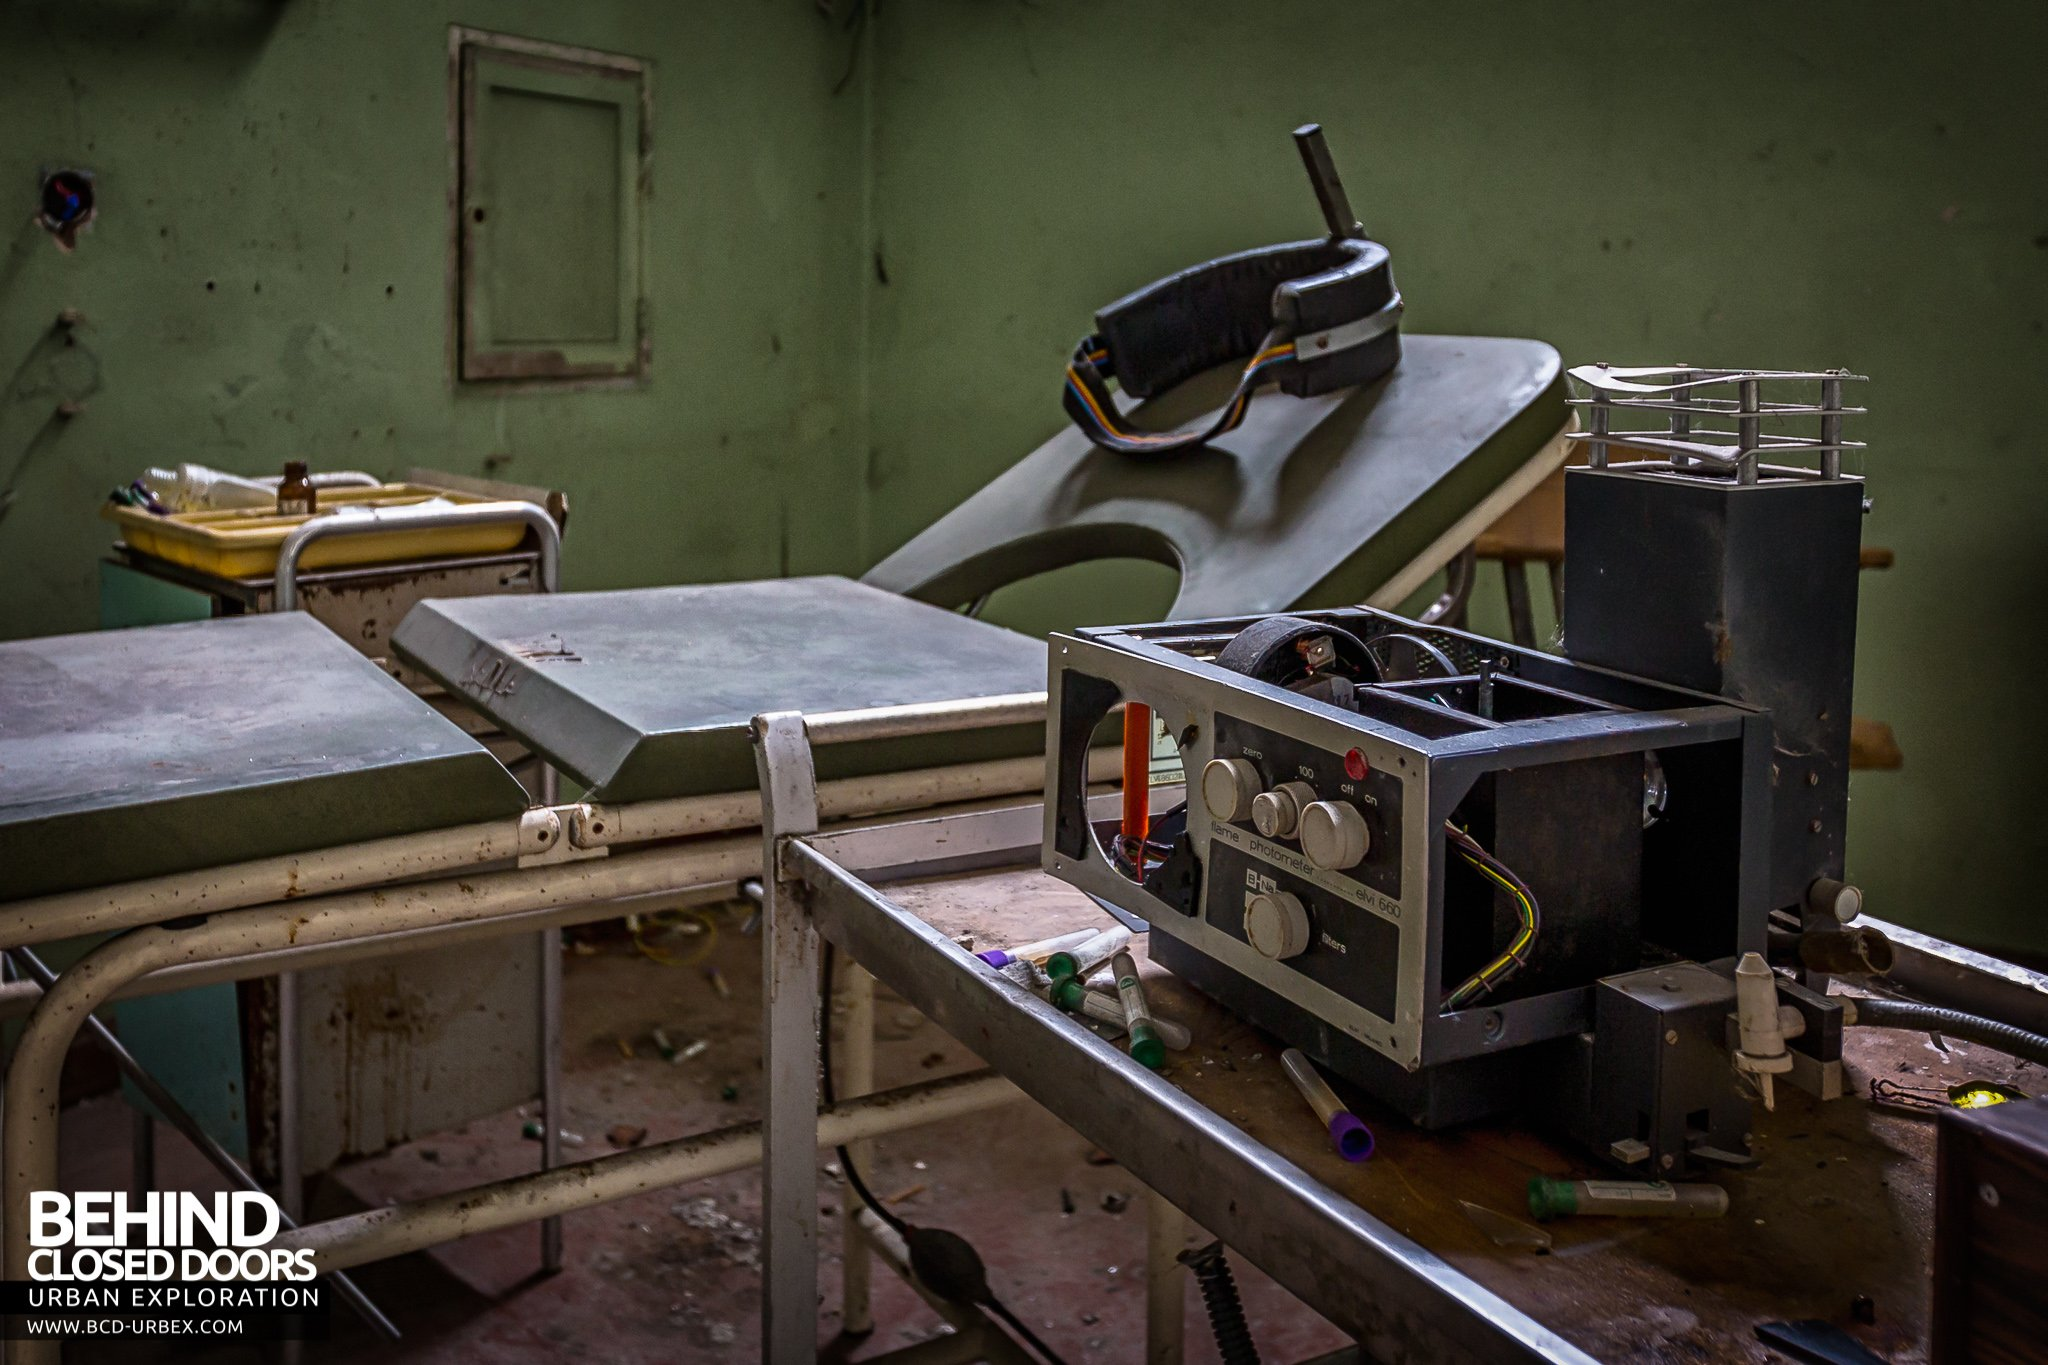 Manicomio Di C Abandoned Asylum Italy 187 Urbex Behind